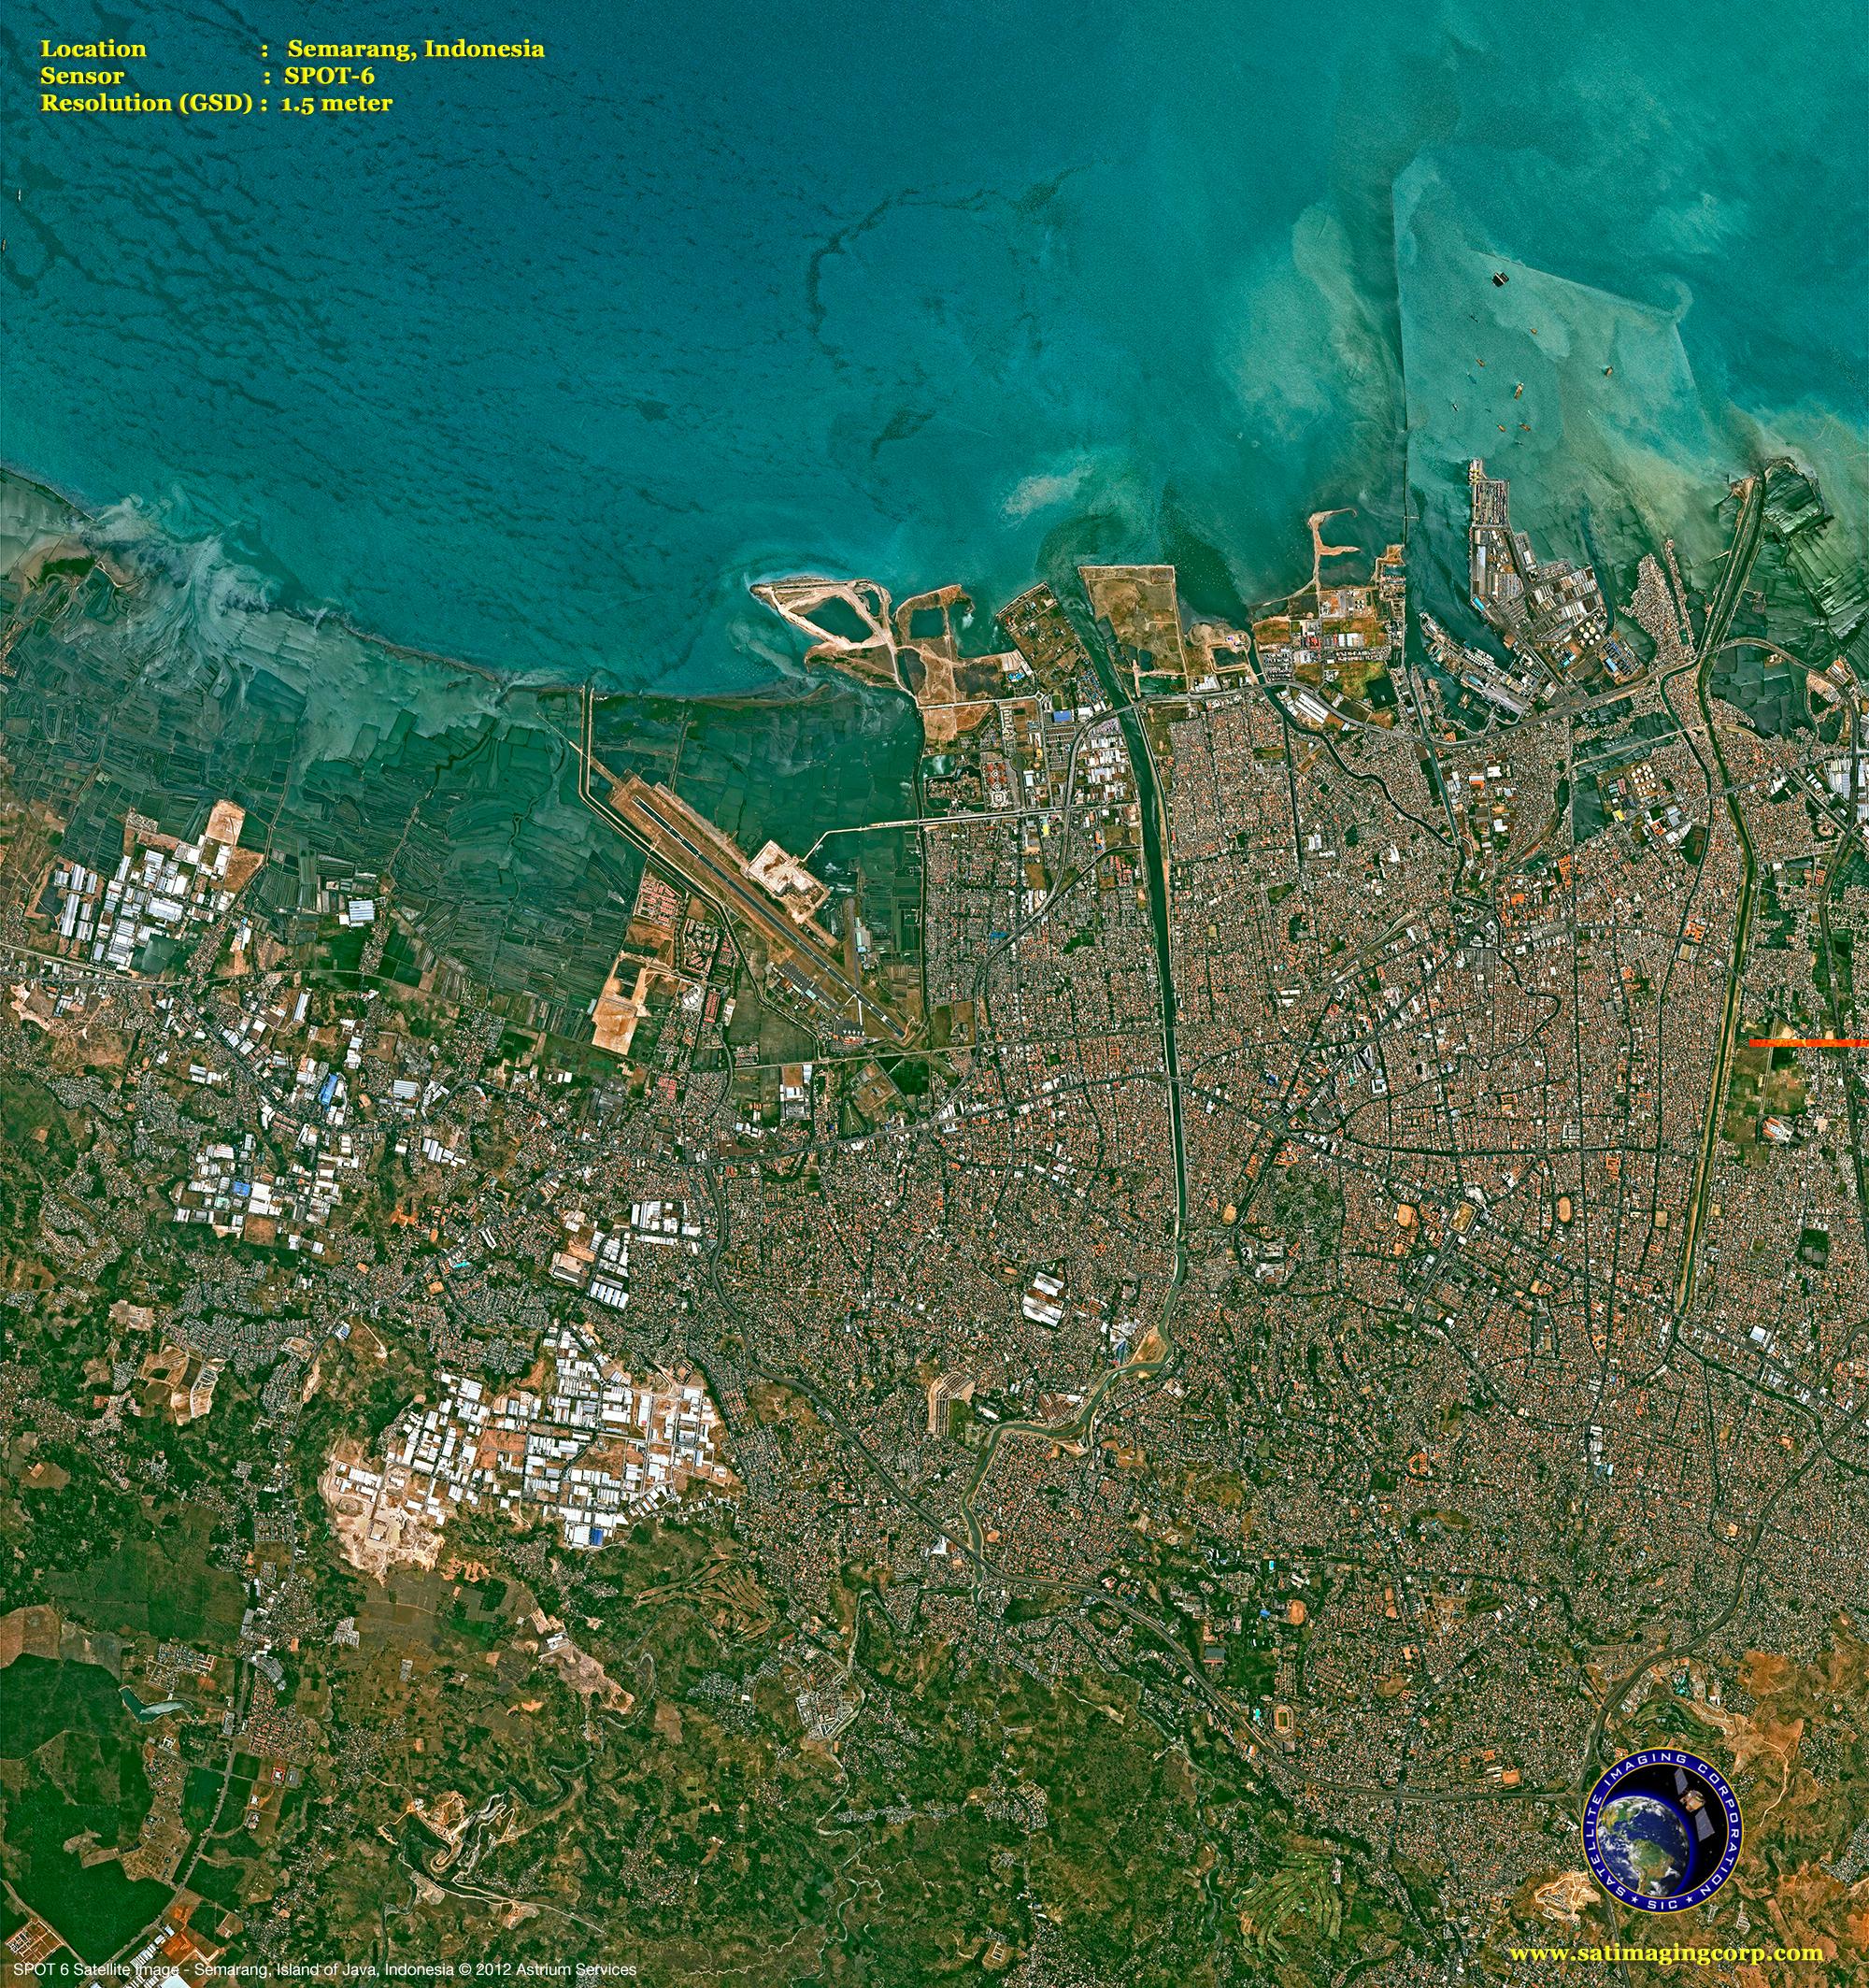 Semarang Indonesia  city images : SPOT 6 Satellite Image of Semarang, Indonesia | Satellite Imaging Corp